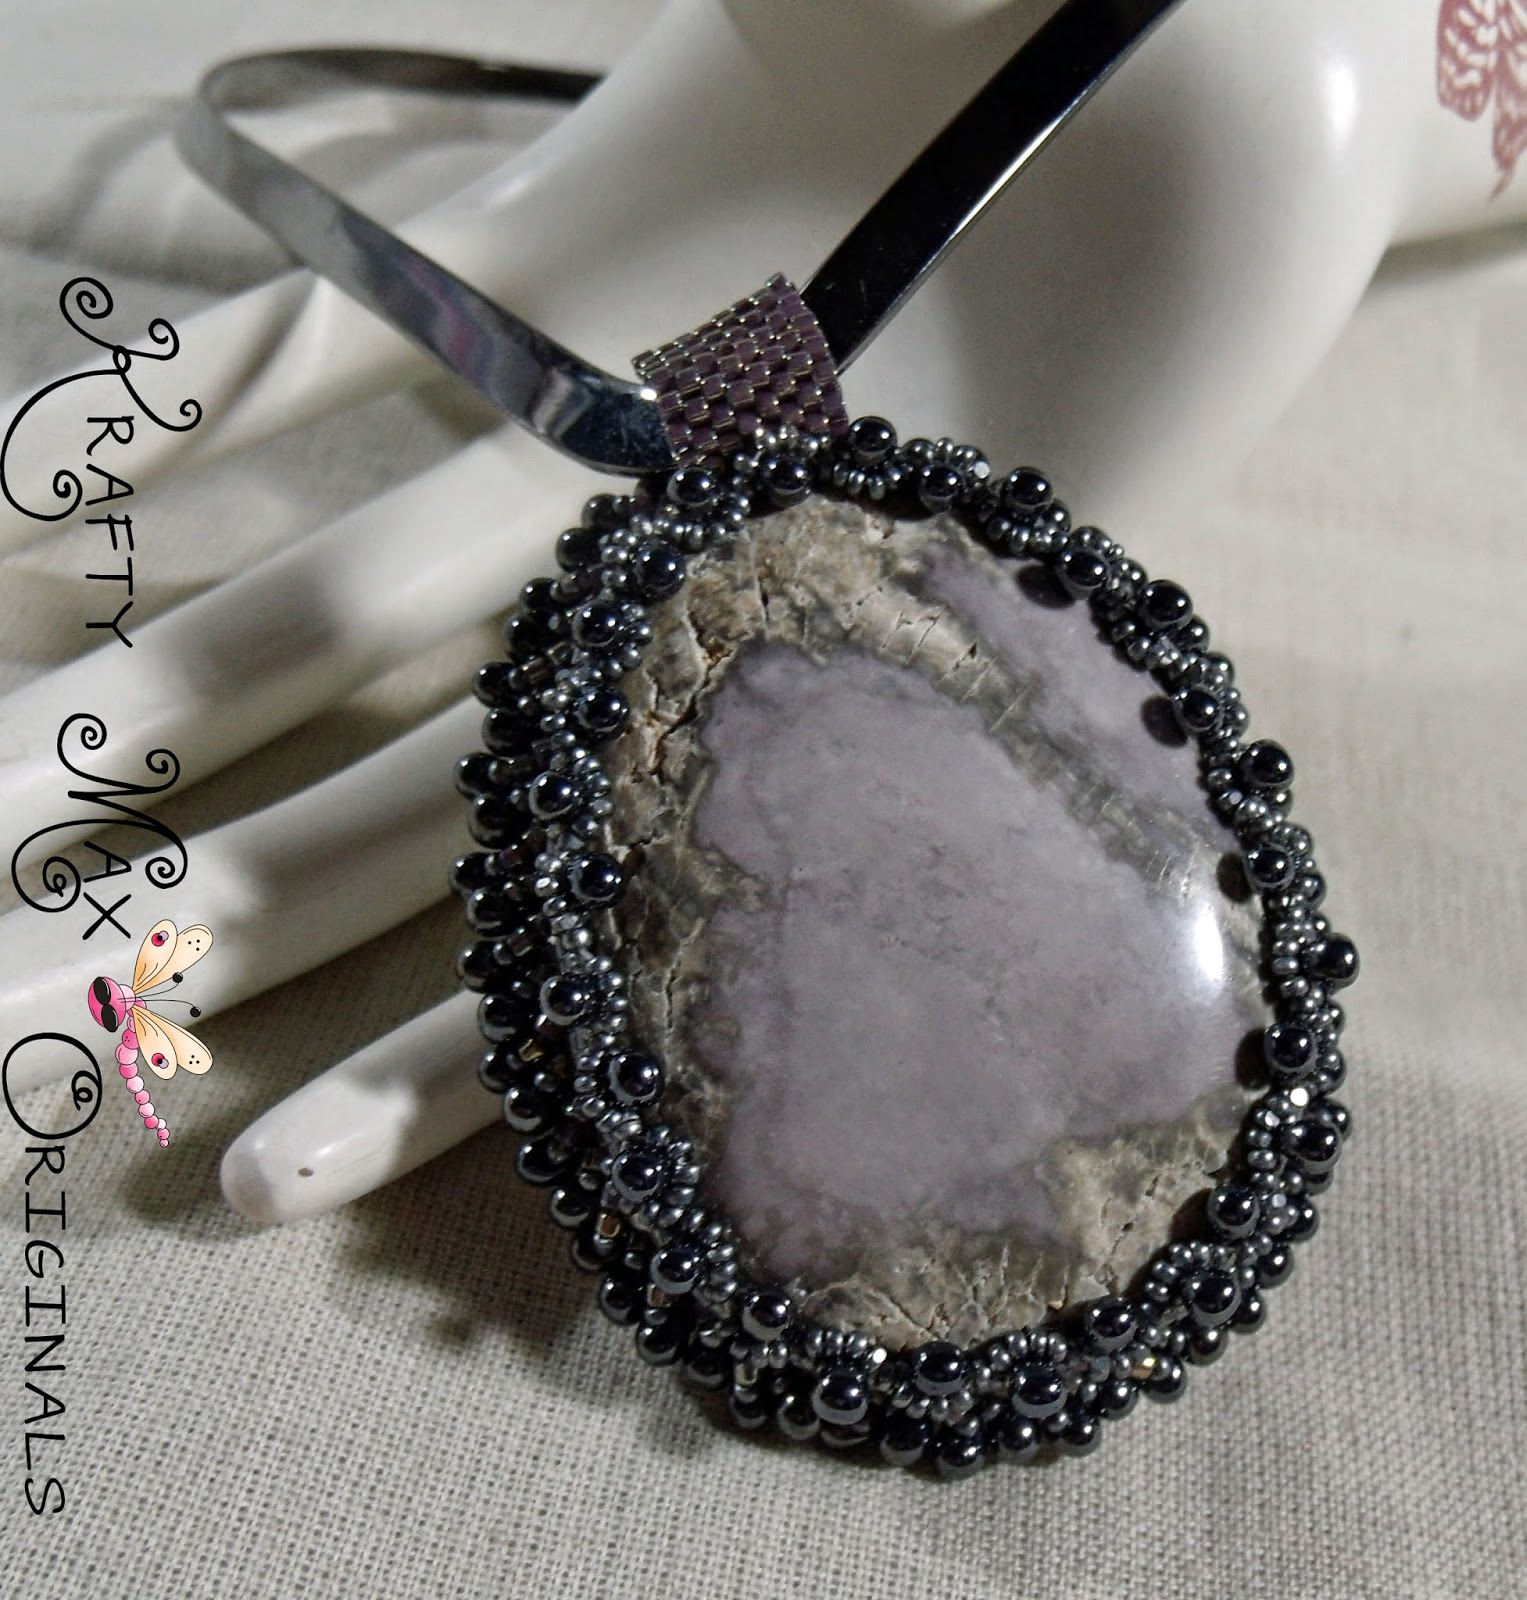 http://www.artfire.com/ext/shop/product_view/8972000